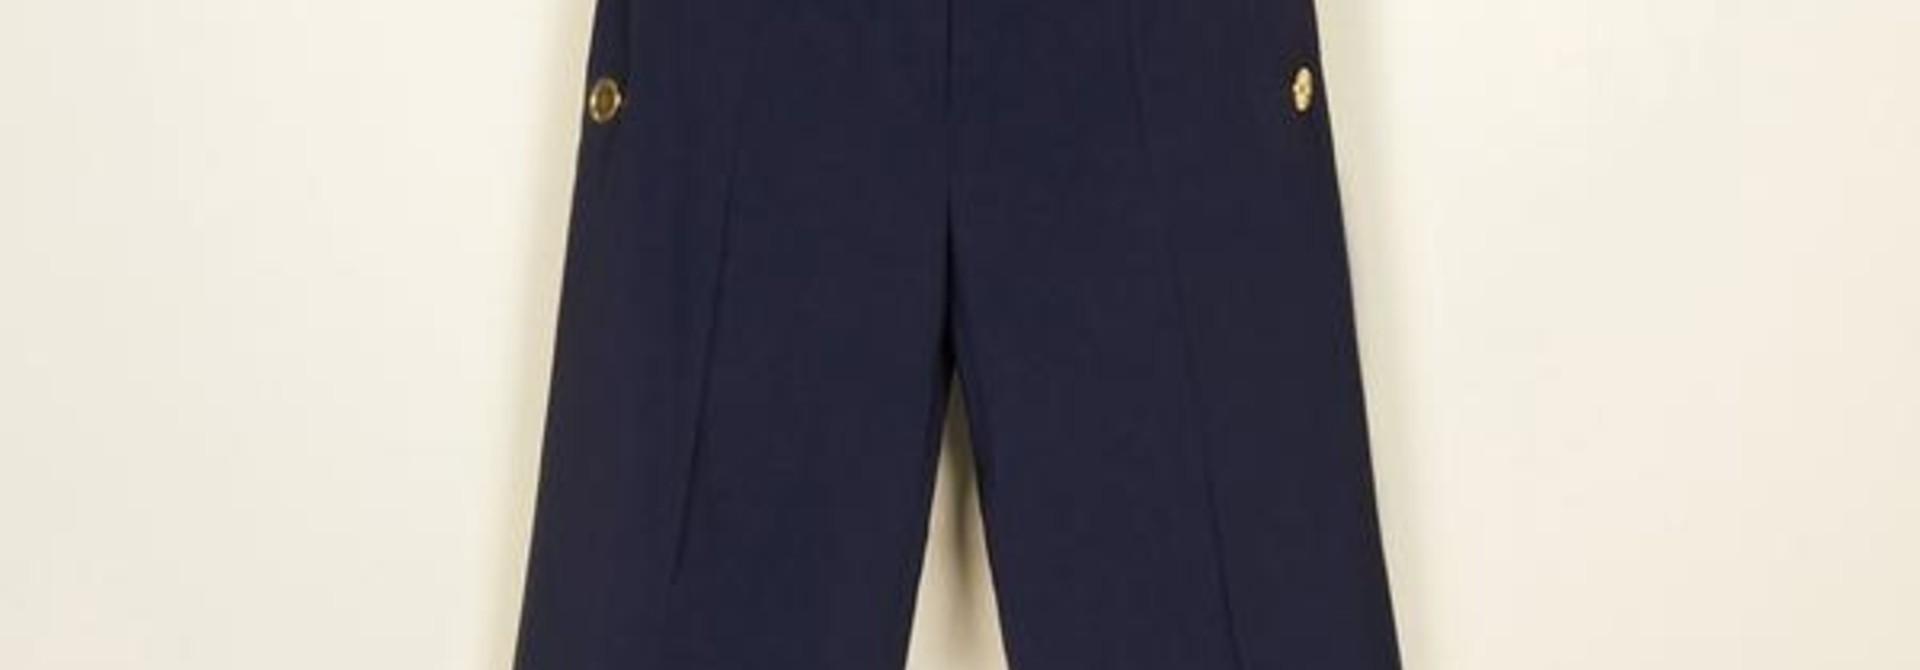 Summer Wool Sailor Trousers - Navy - Sz. 36